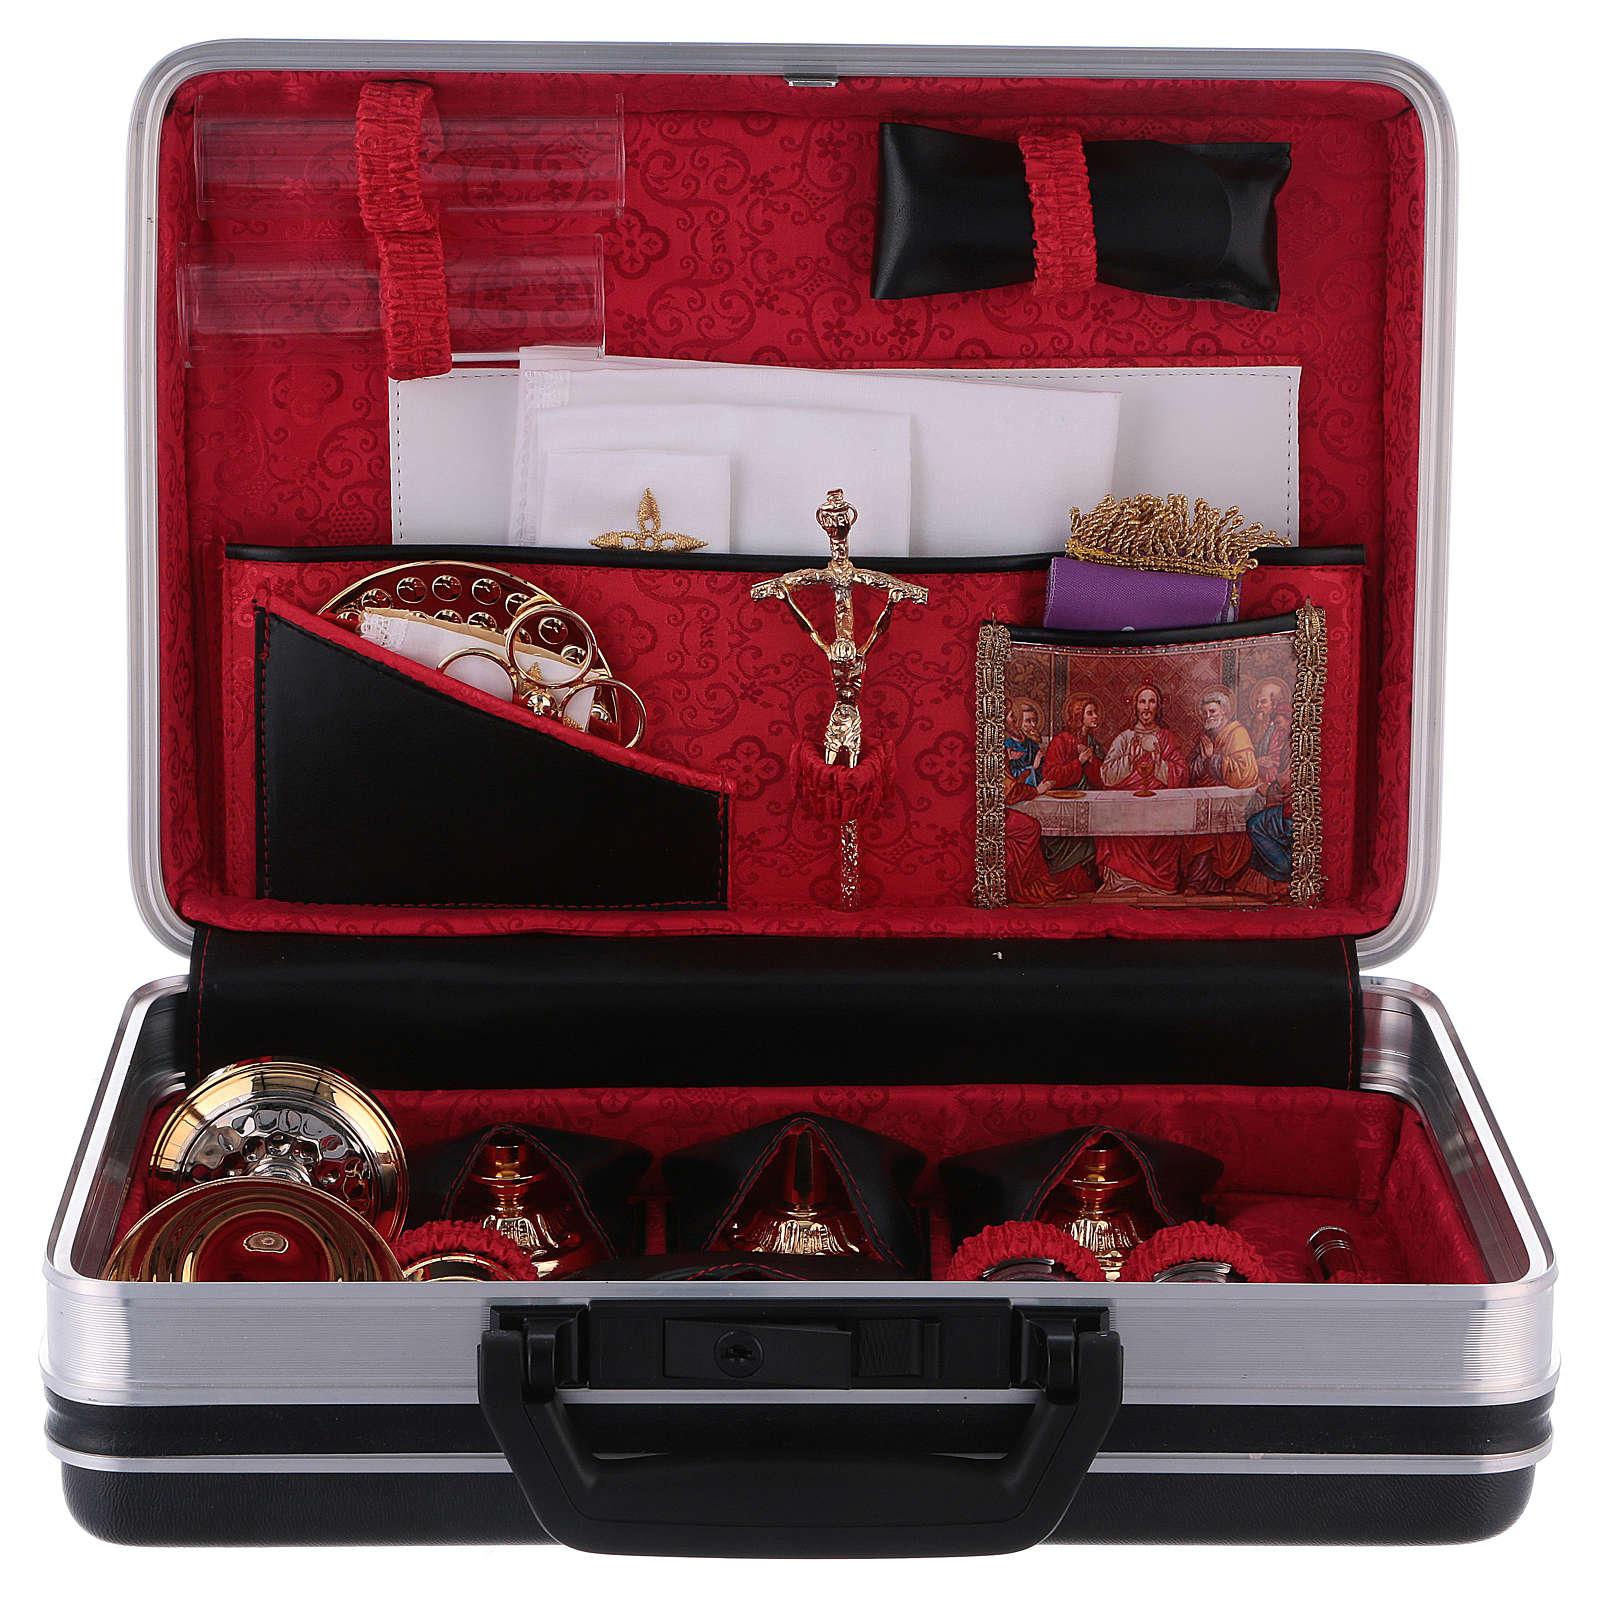 Valigetta per celebrazioni 24 x 35 cm fodera jacquard rosso 3